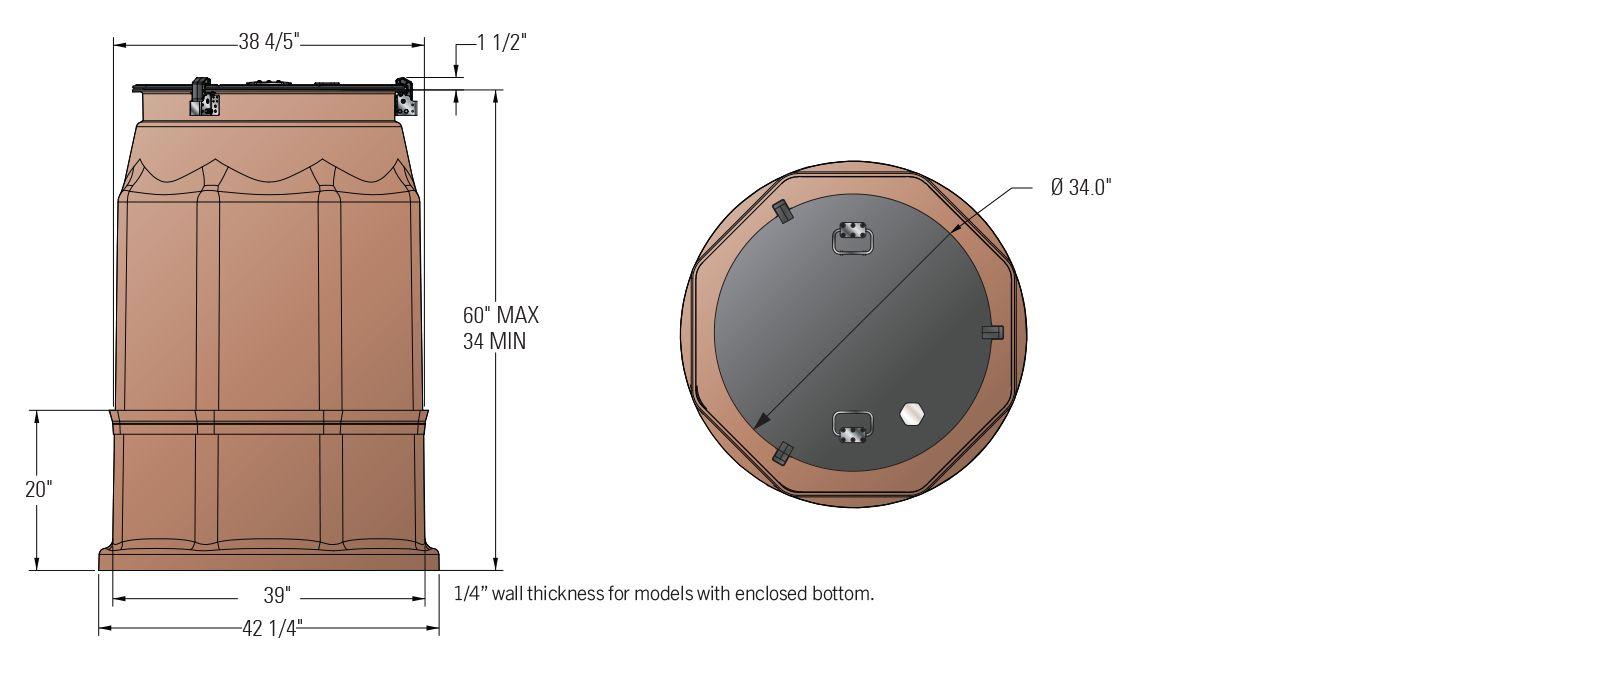 Watertight Tank Sump - 42 Inch - Dims.psd